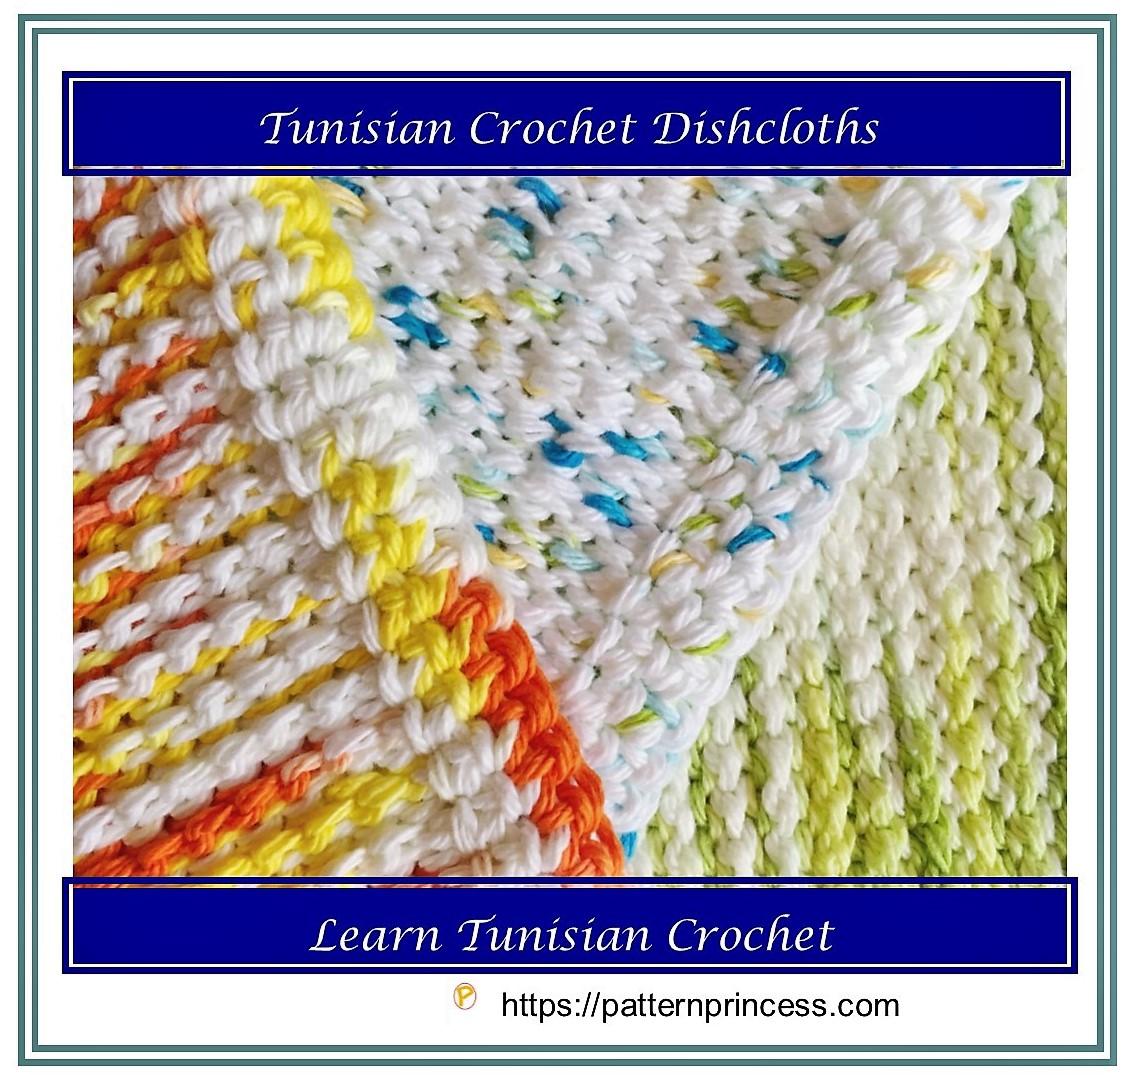 Tunisian Crochet Dishcloths